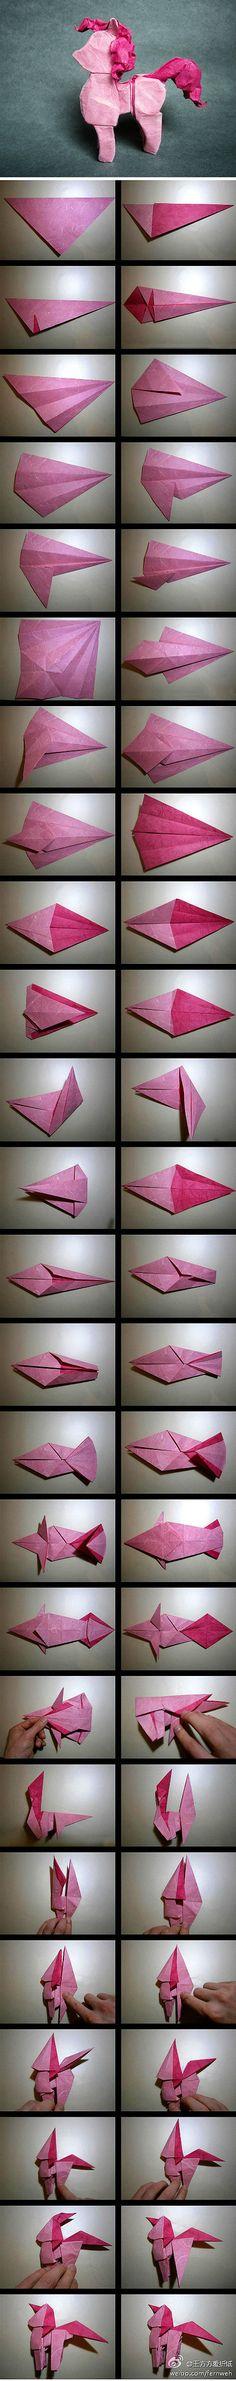 my little pony, origami  折纸 靓图 纸艺 德国折纸达人daniel chang设计并制作的粉…